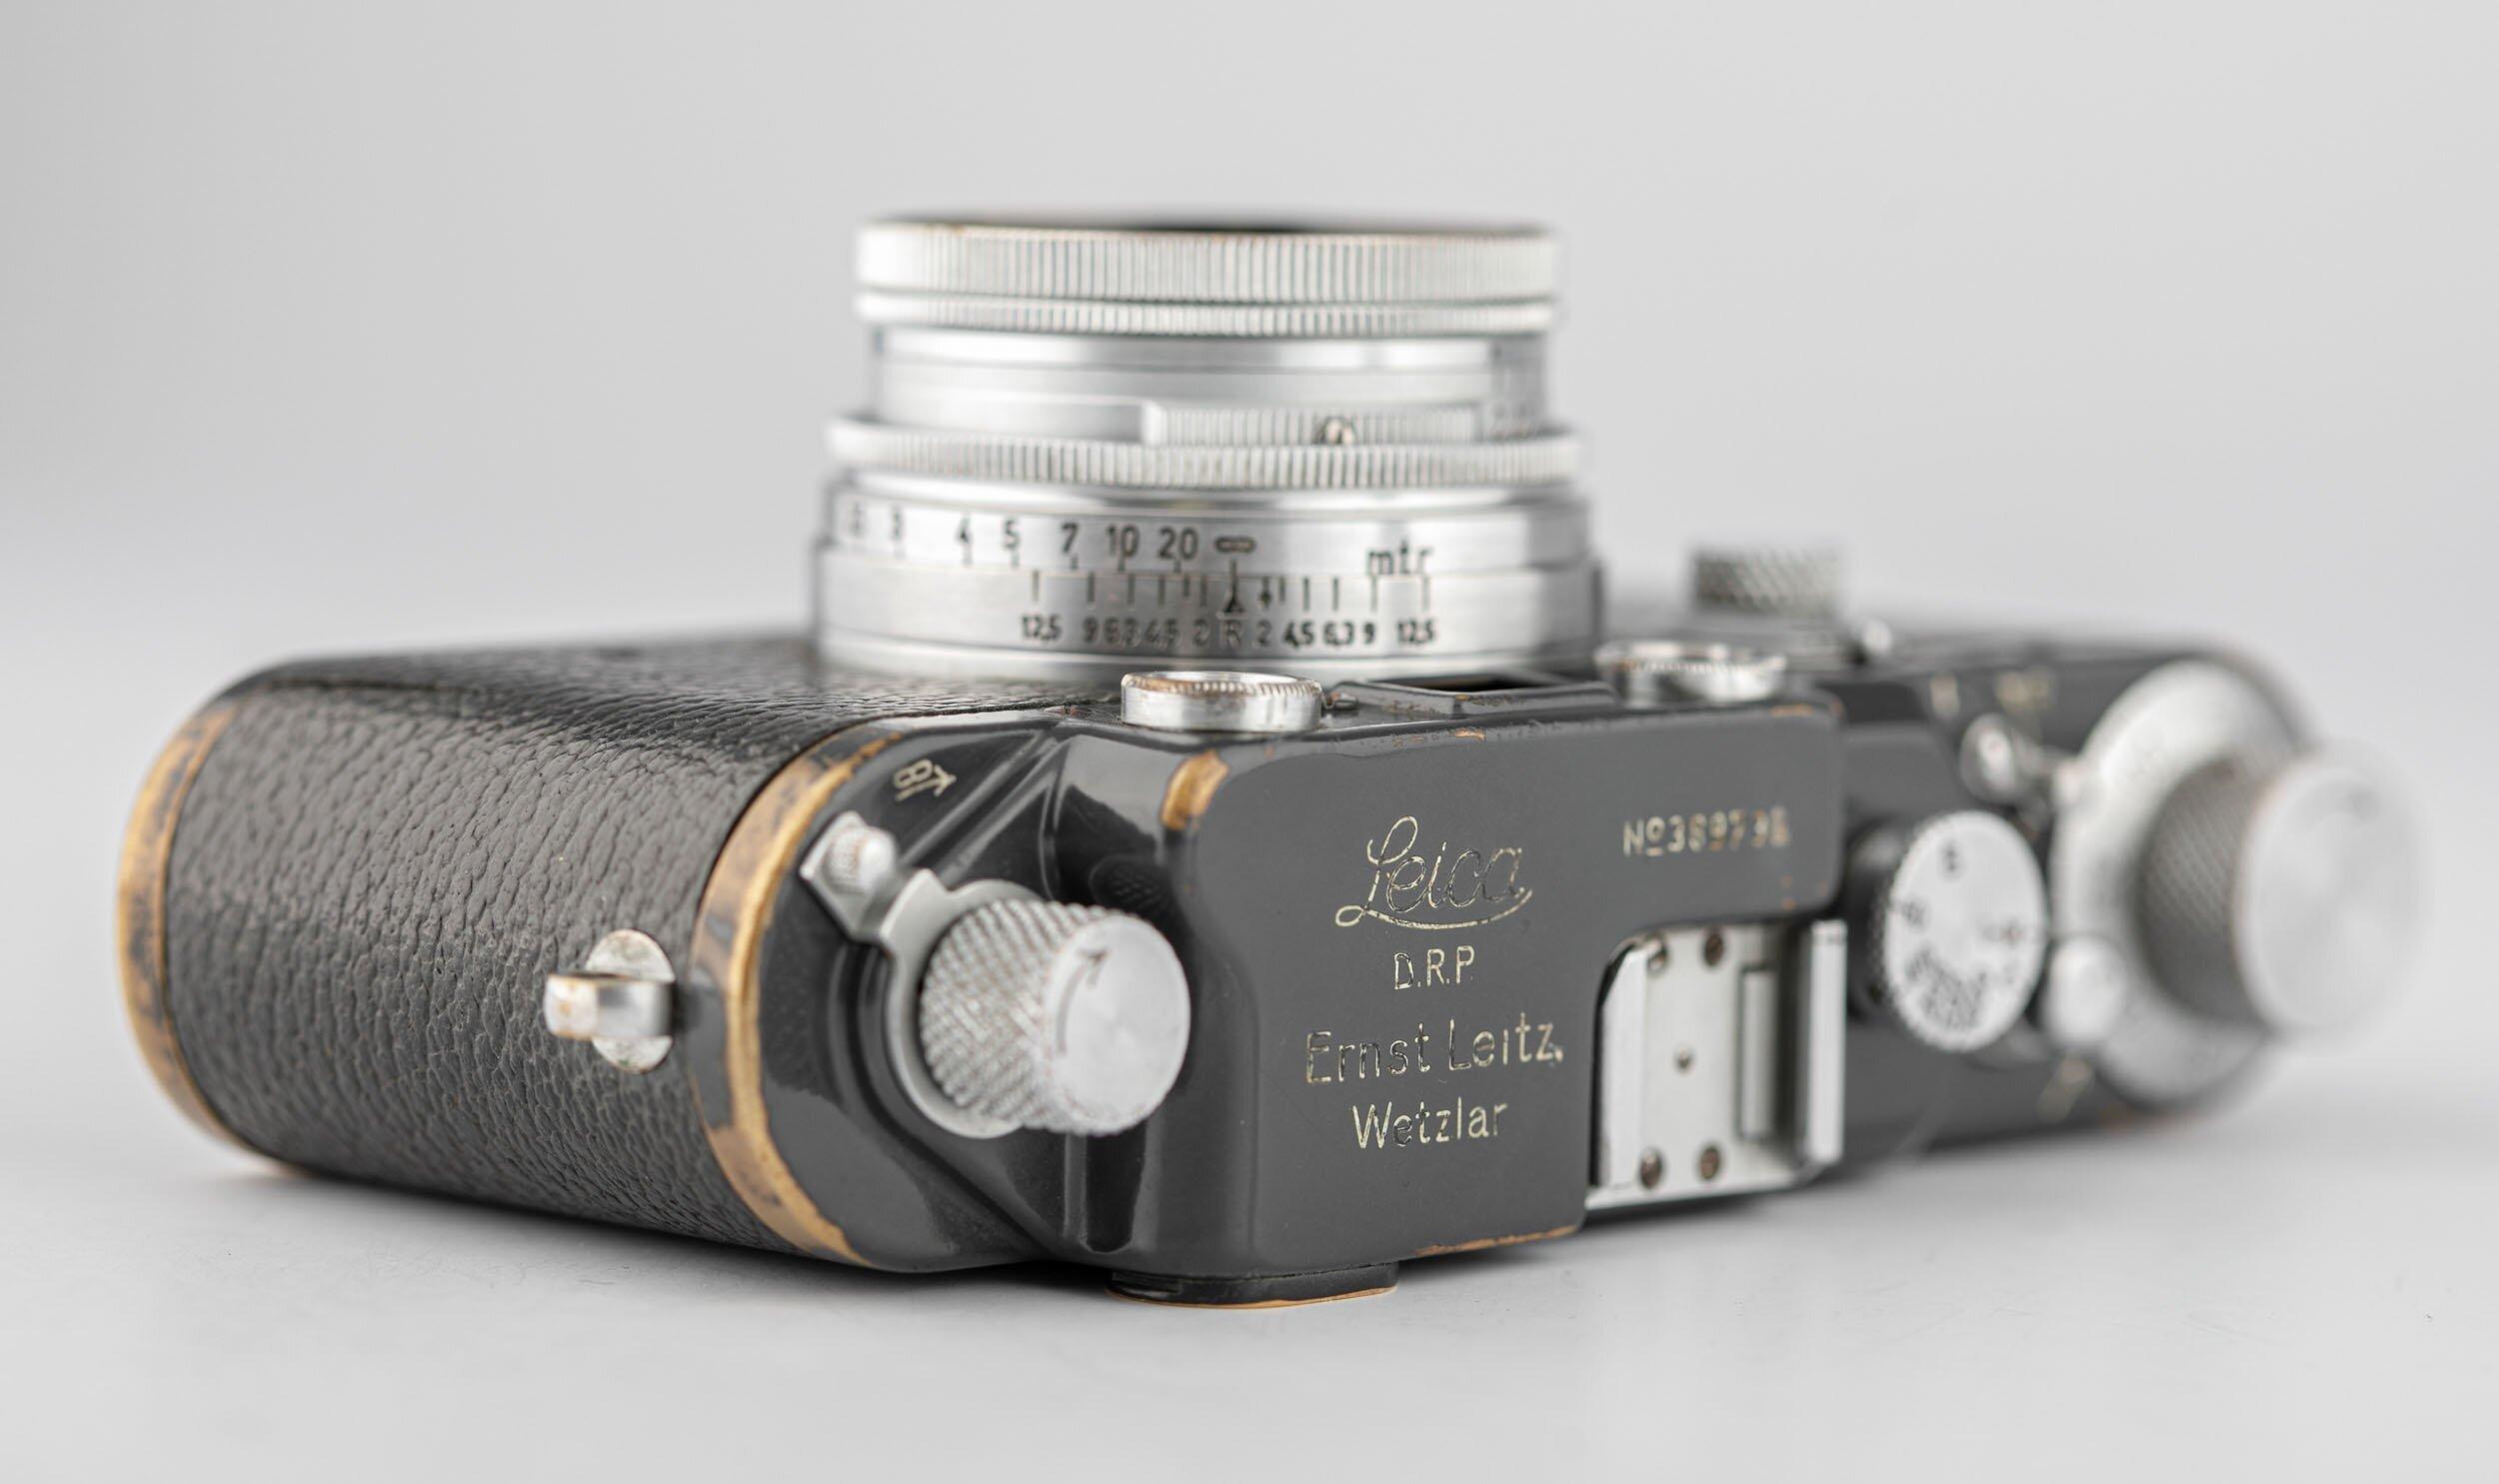 Leica IIIc gray military 69736 + Summitar 5cm F2